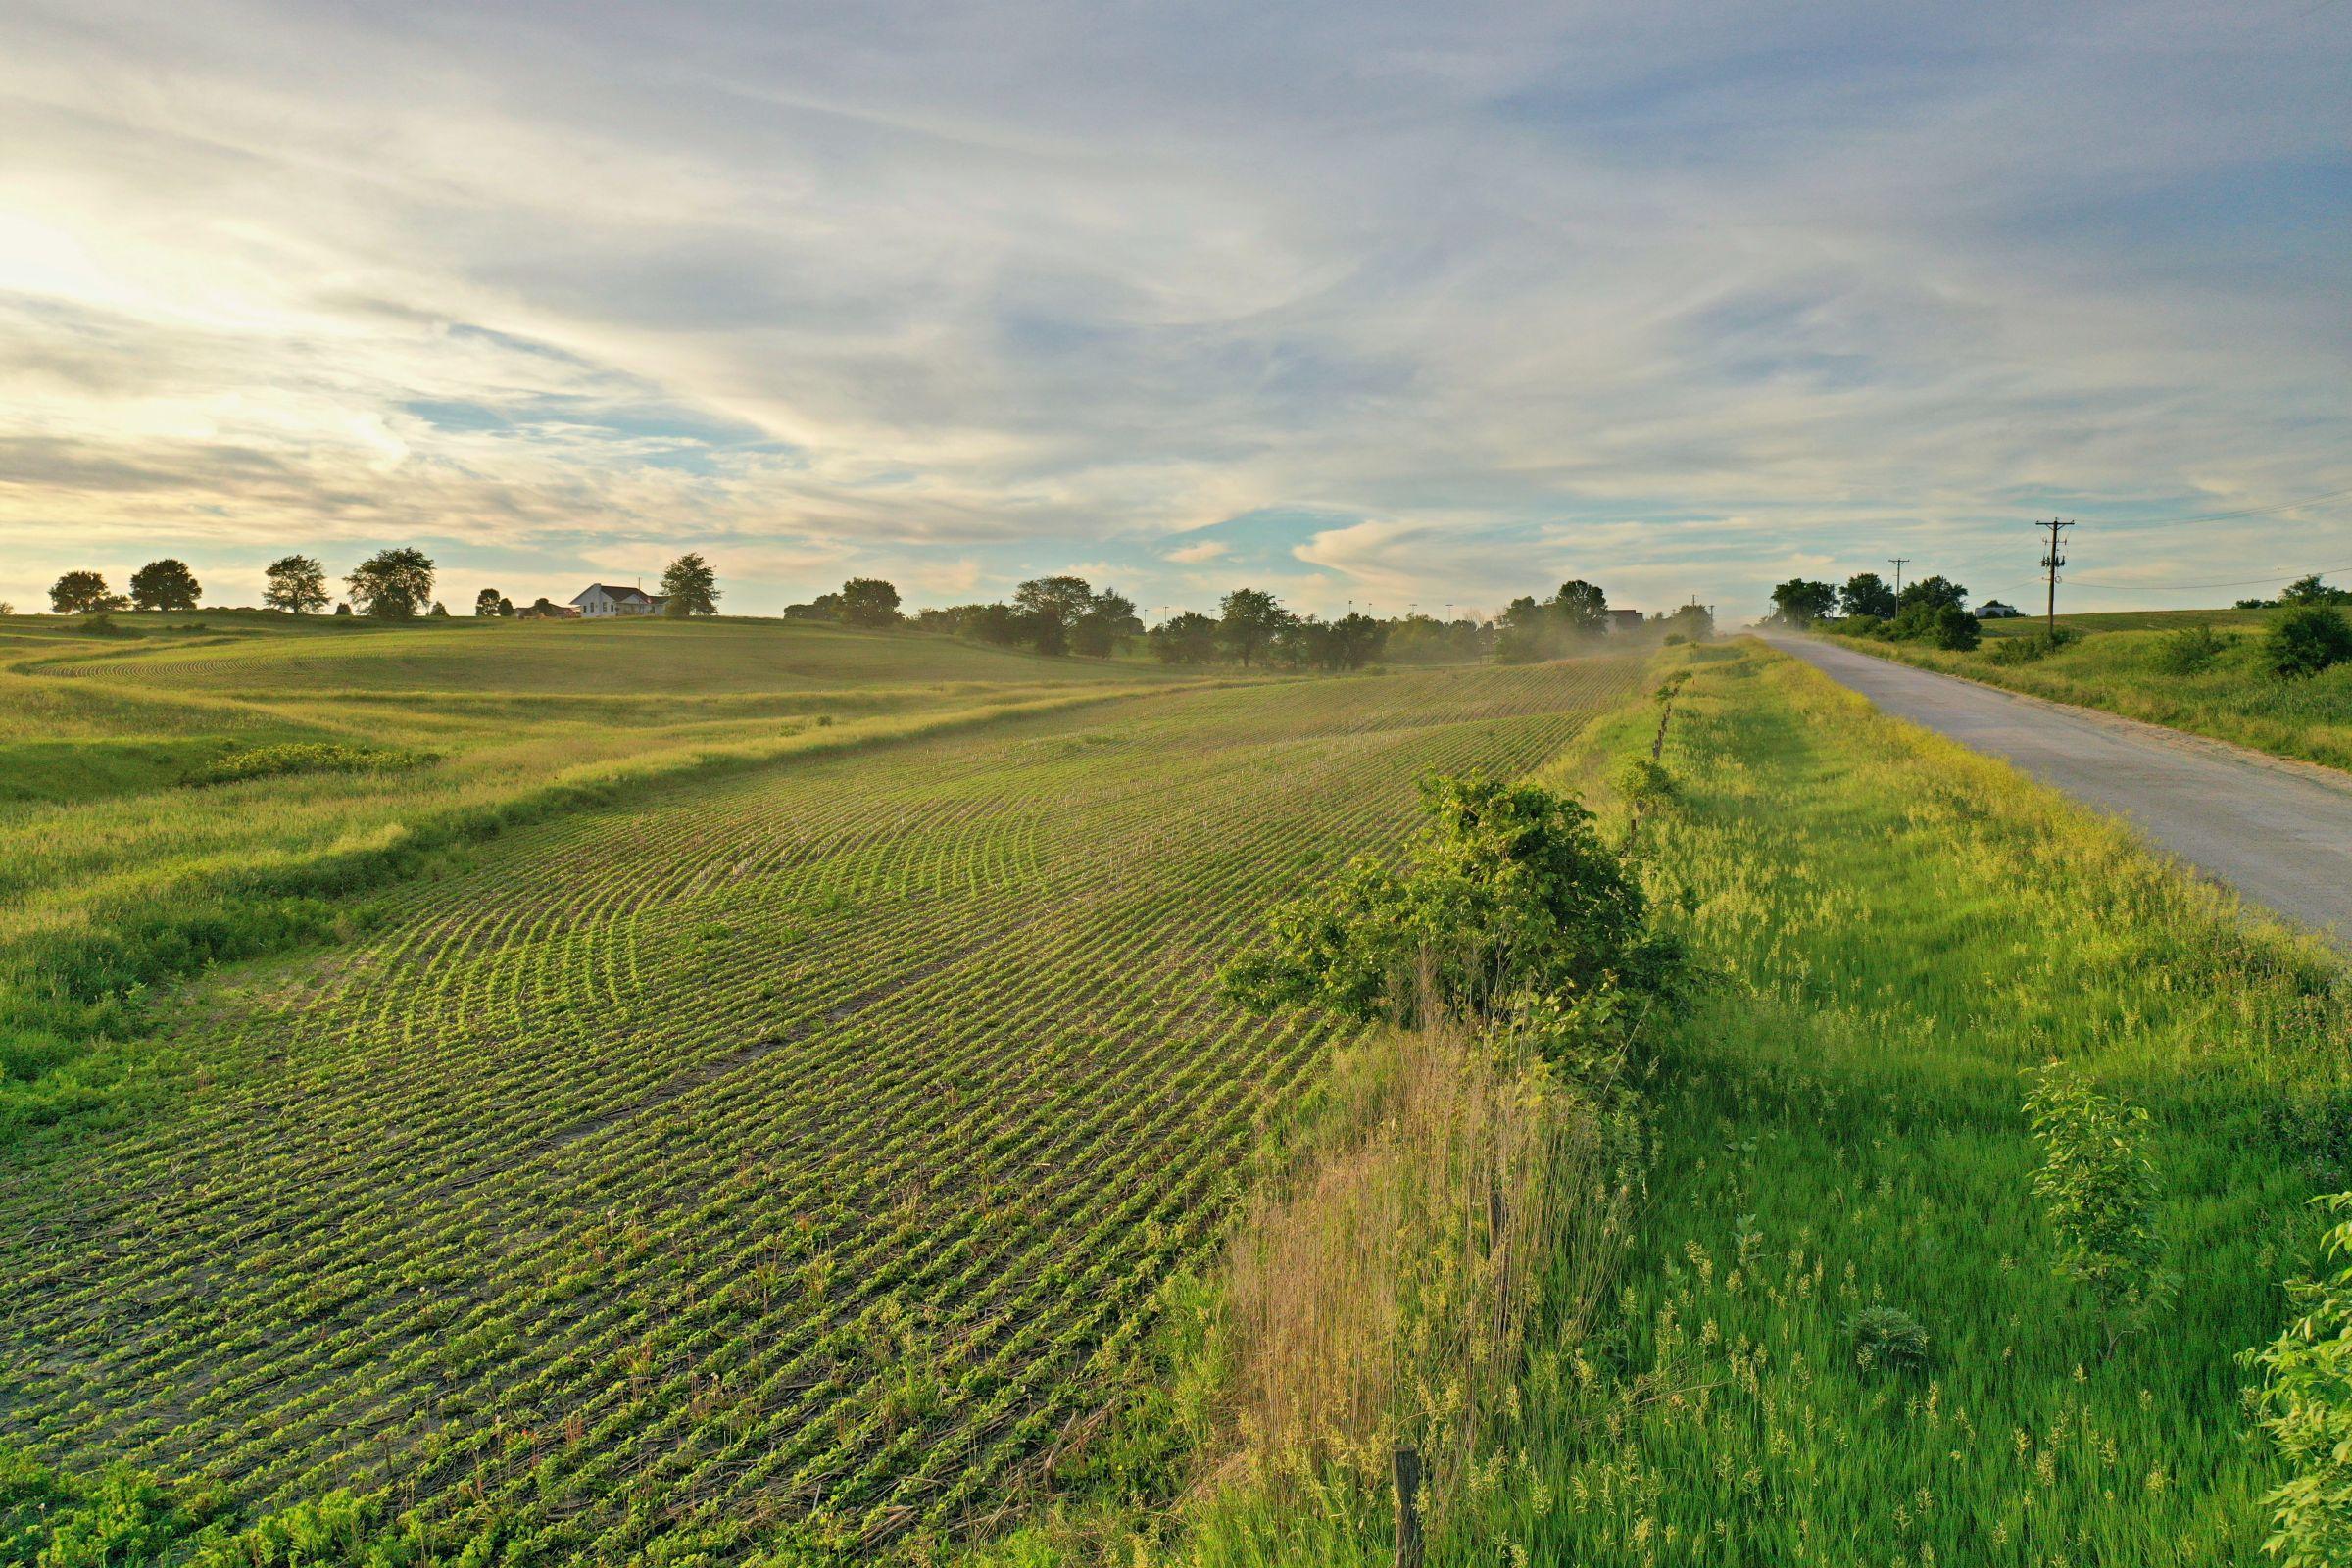 land-warren-county-iowa-20-acres-listing-number-15426-0-2021-03-24-185839.JPG